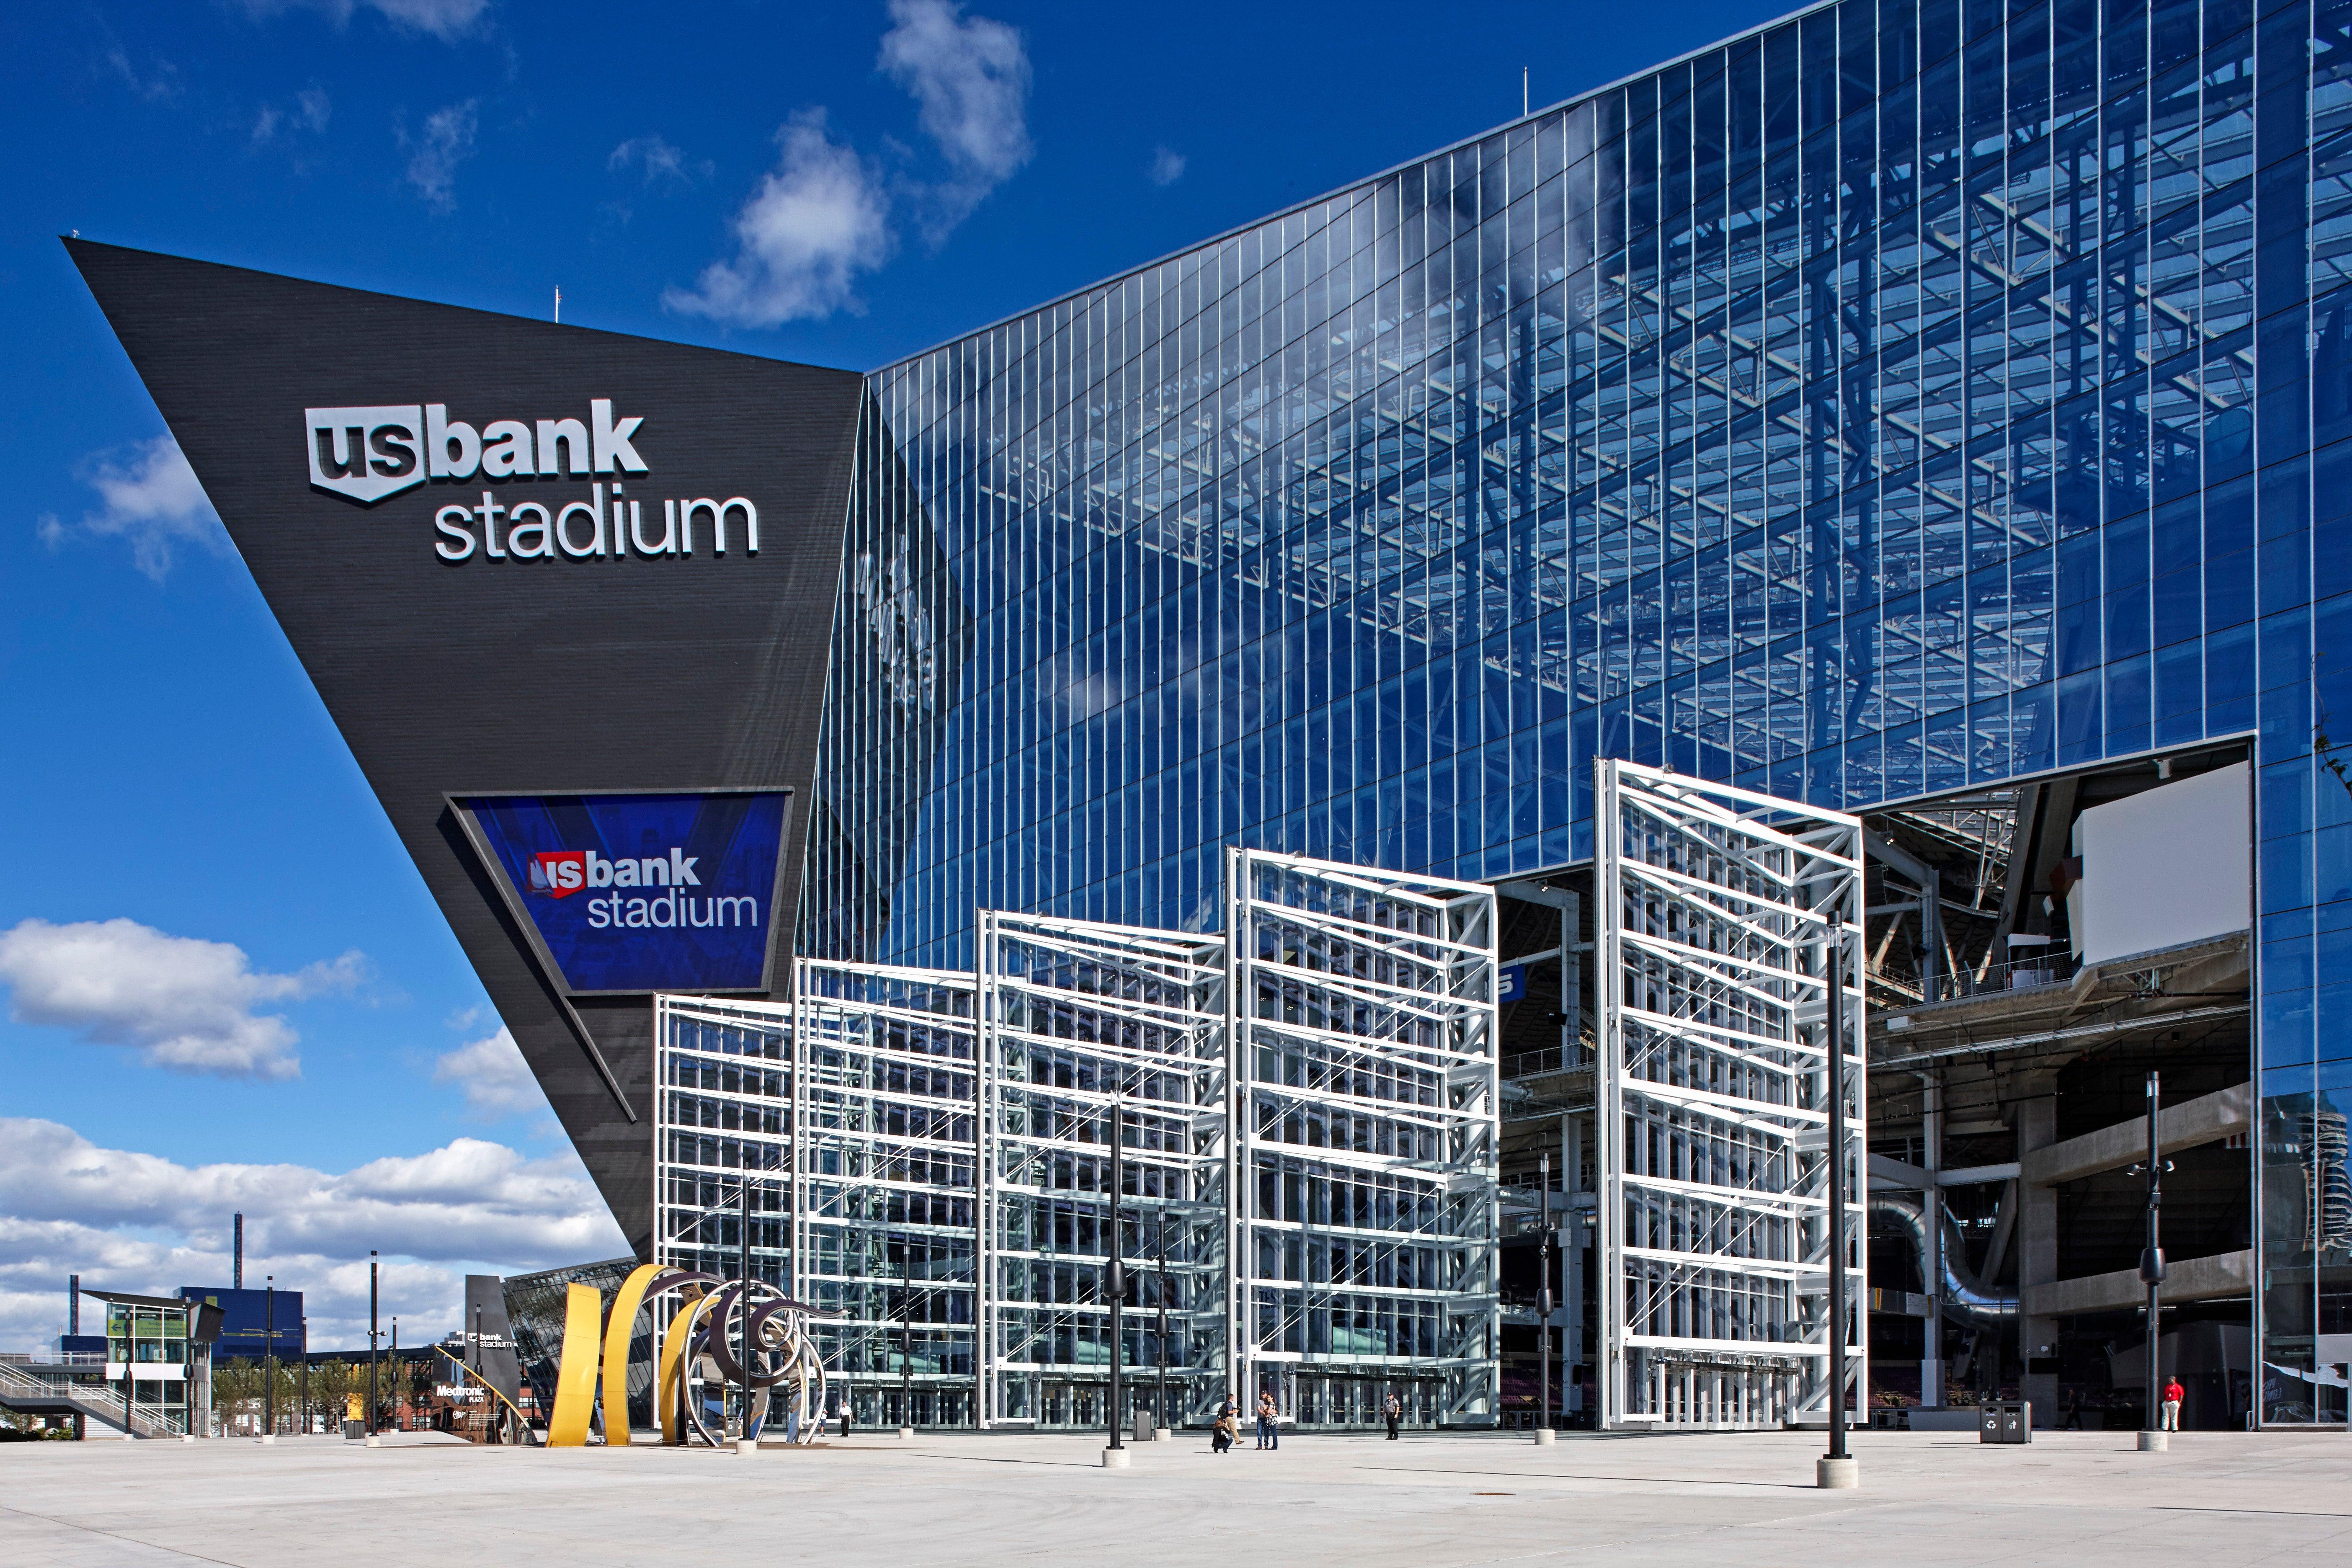 Exterior: U.S. Bank Stadium